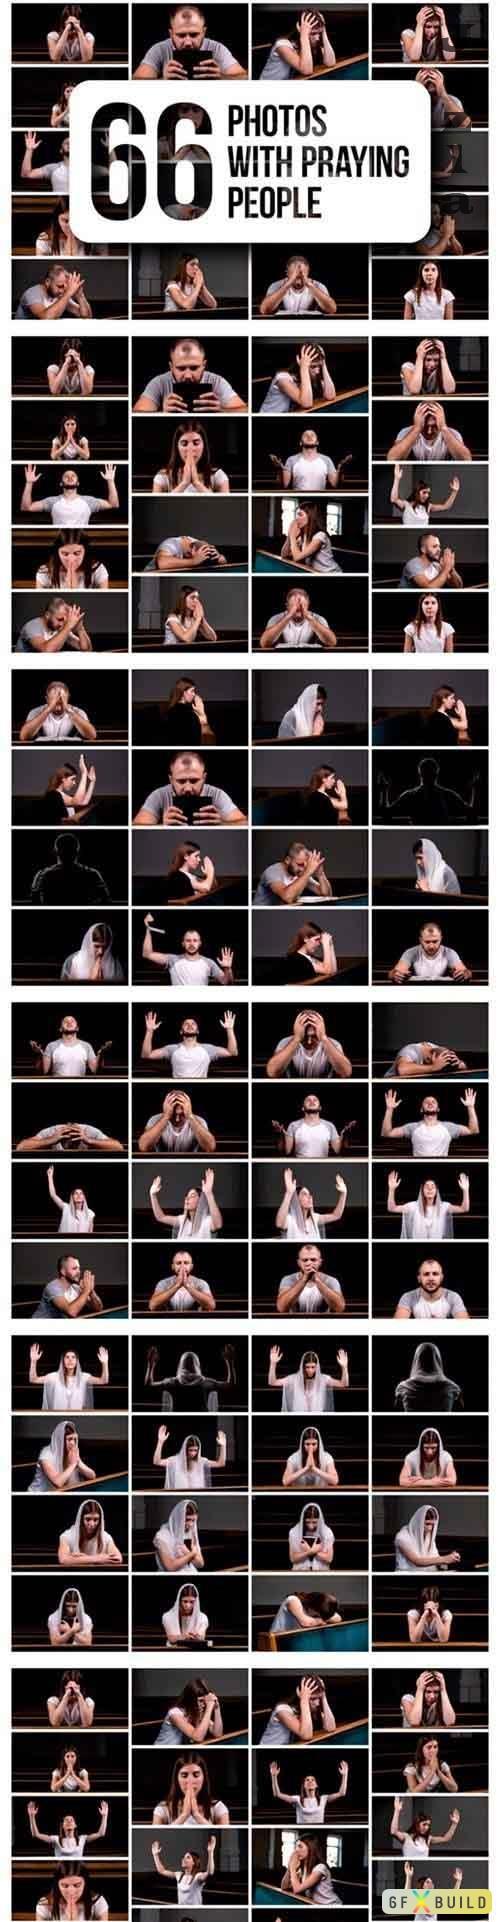 Set of 66 Photos with Praying People